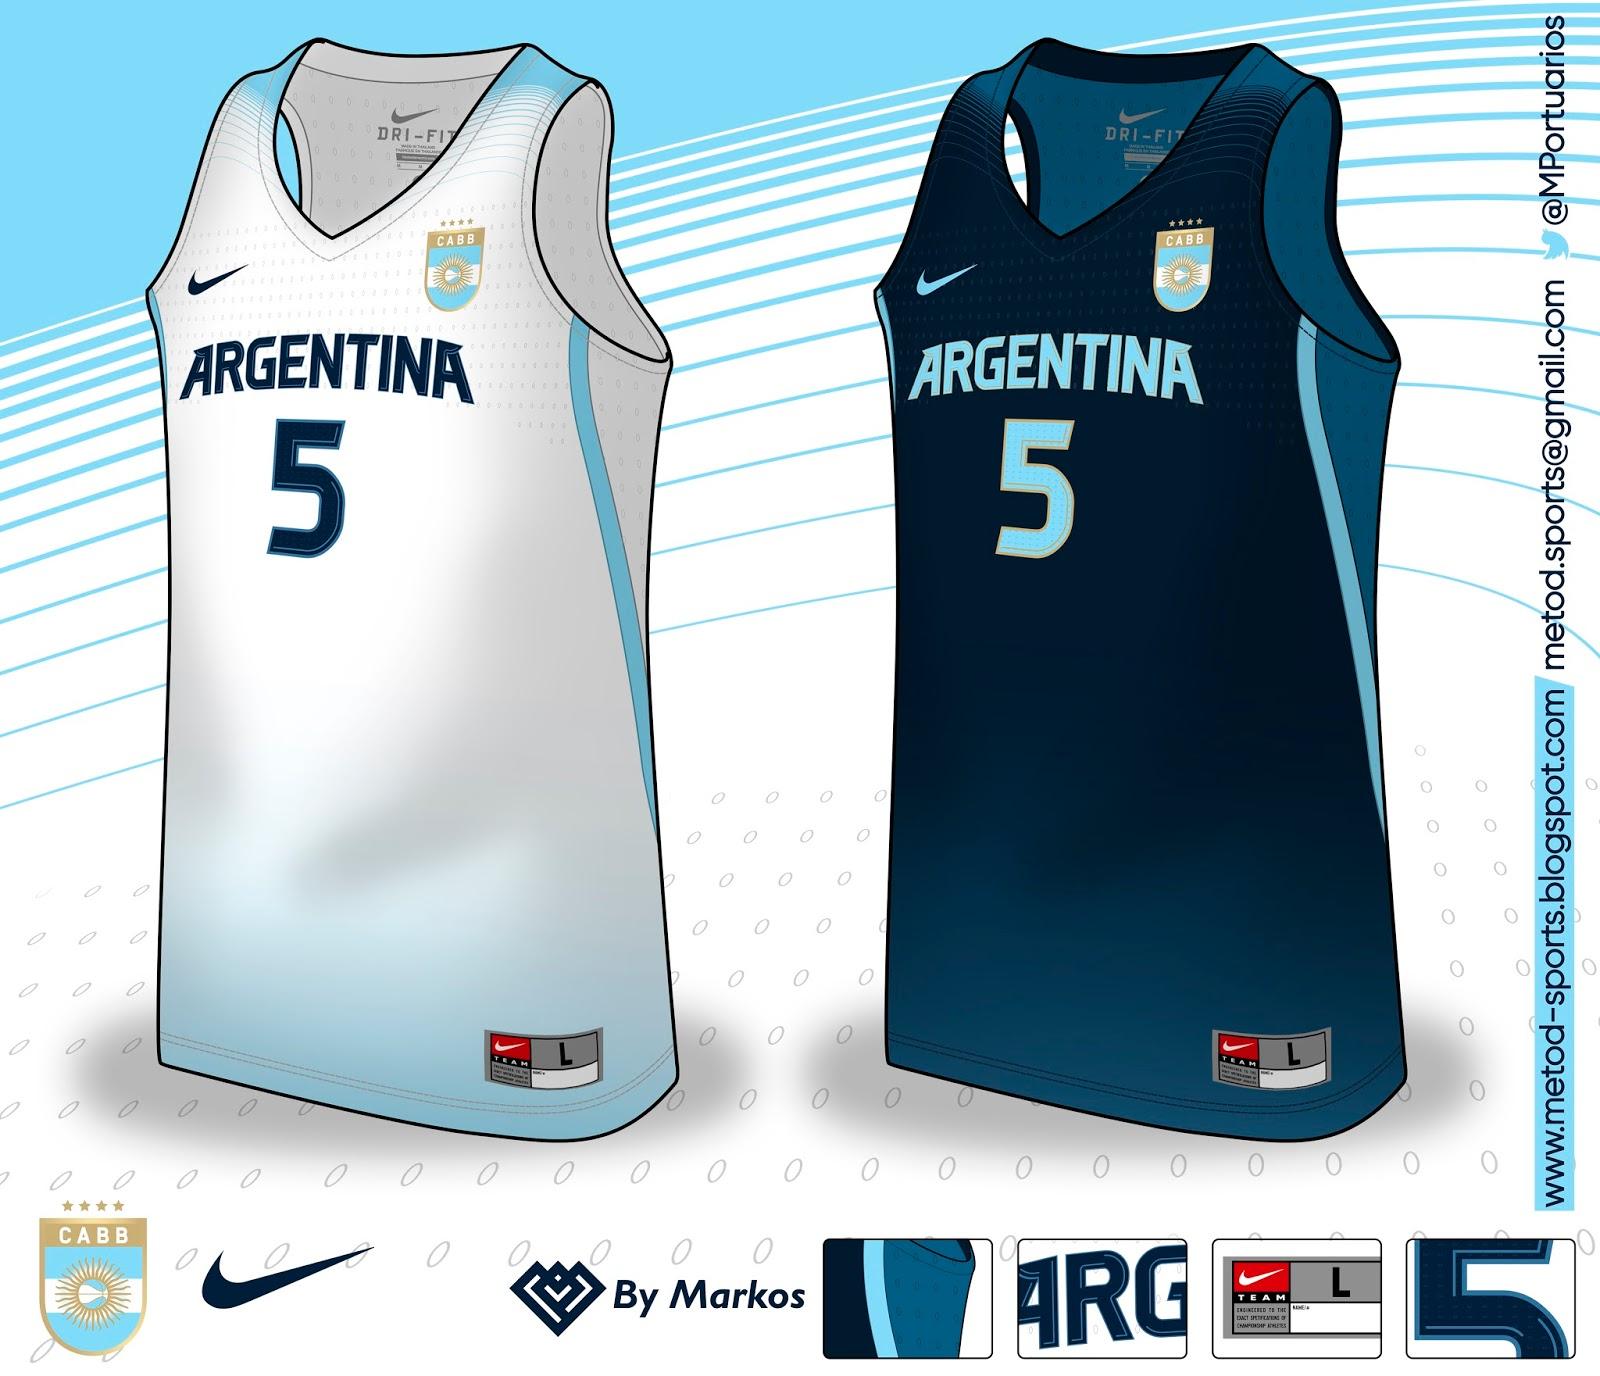 ff08ca6d8f8a4 Metod Sports  Argentina Basquet (C.A.B.B.) 2017 Nike (Real Fantasy)